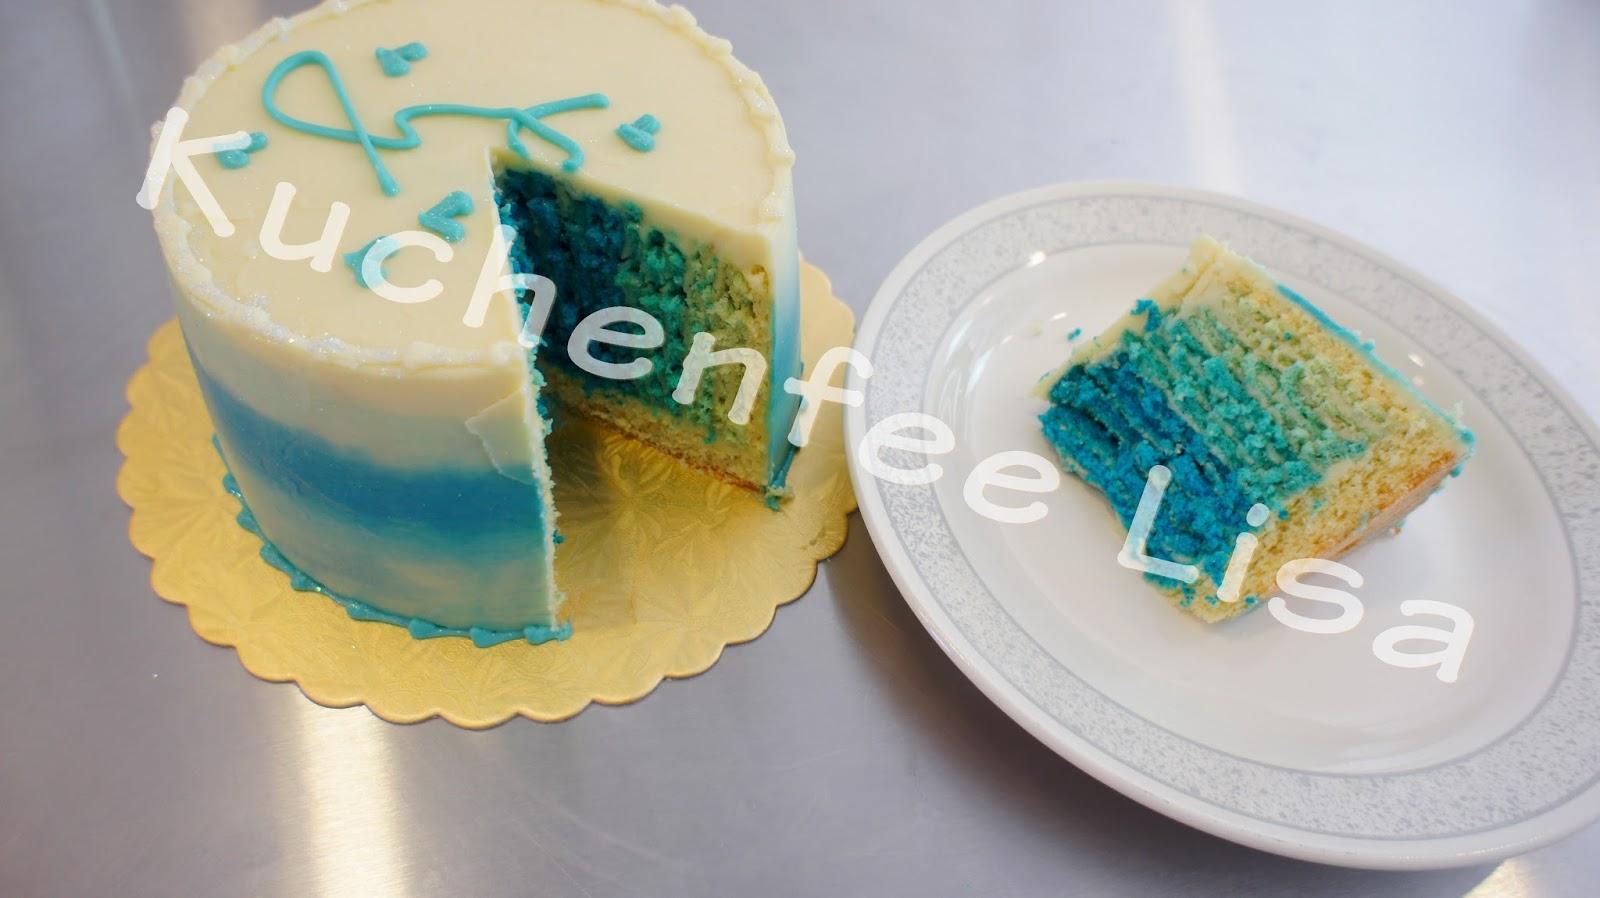 Kuchenfee Lisa Biskuit für Charlotte Biskuitkapsel~ Smeg Kochinsel